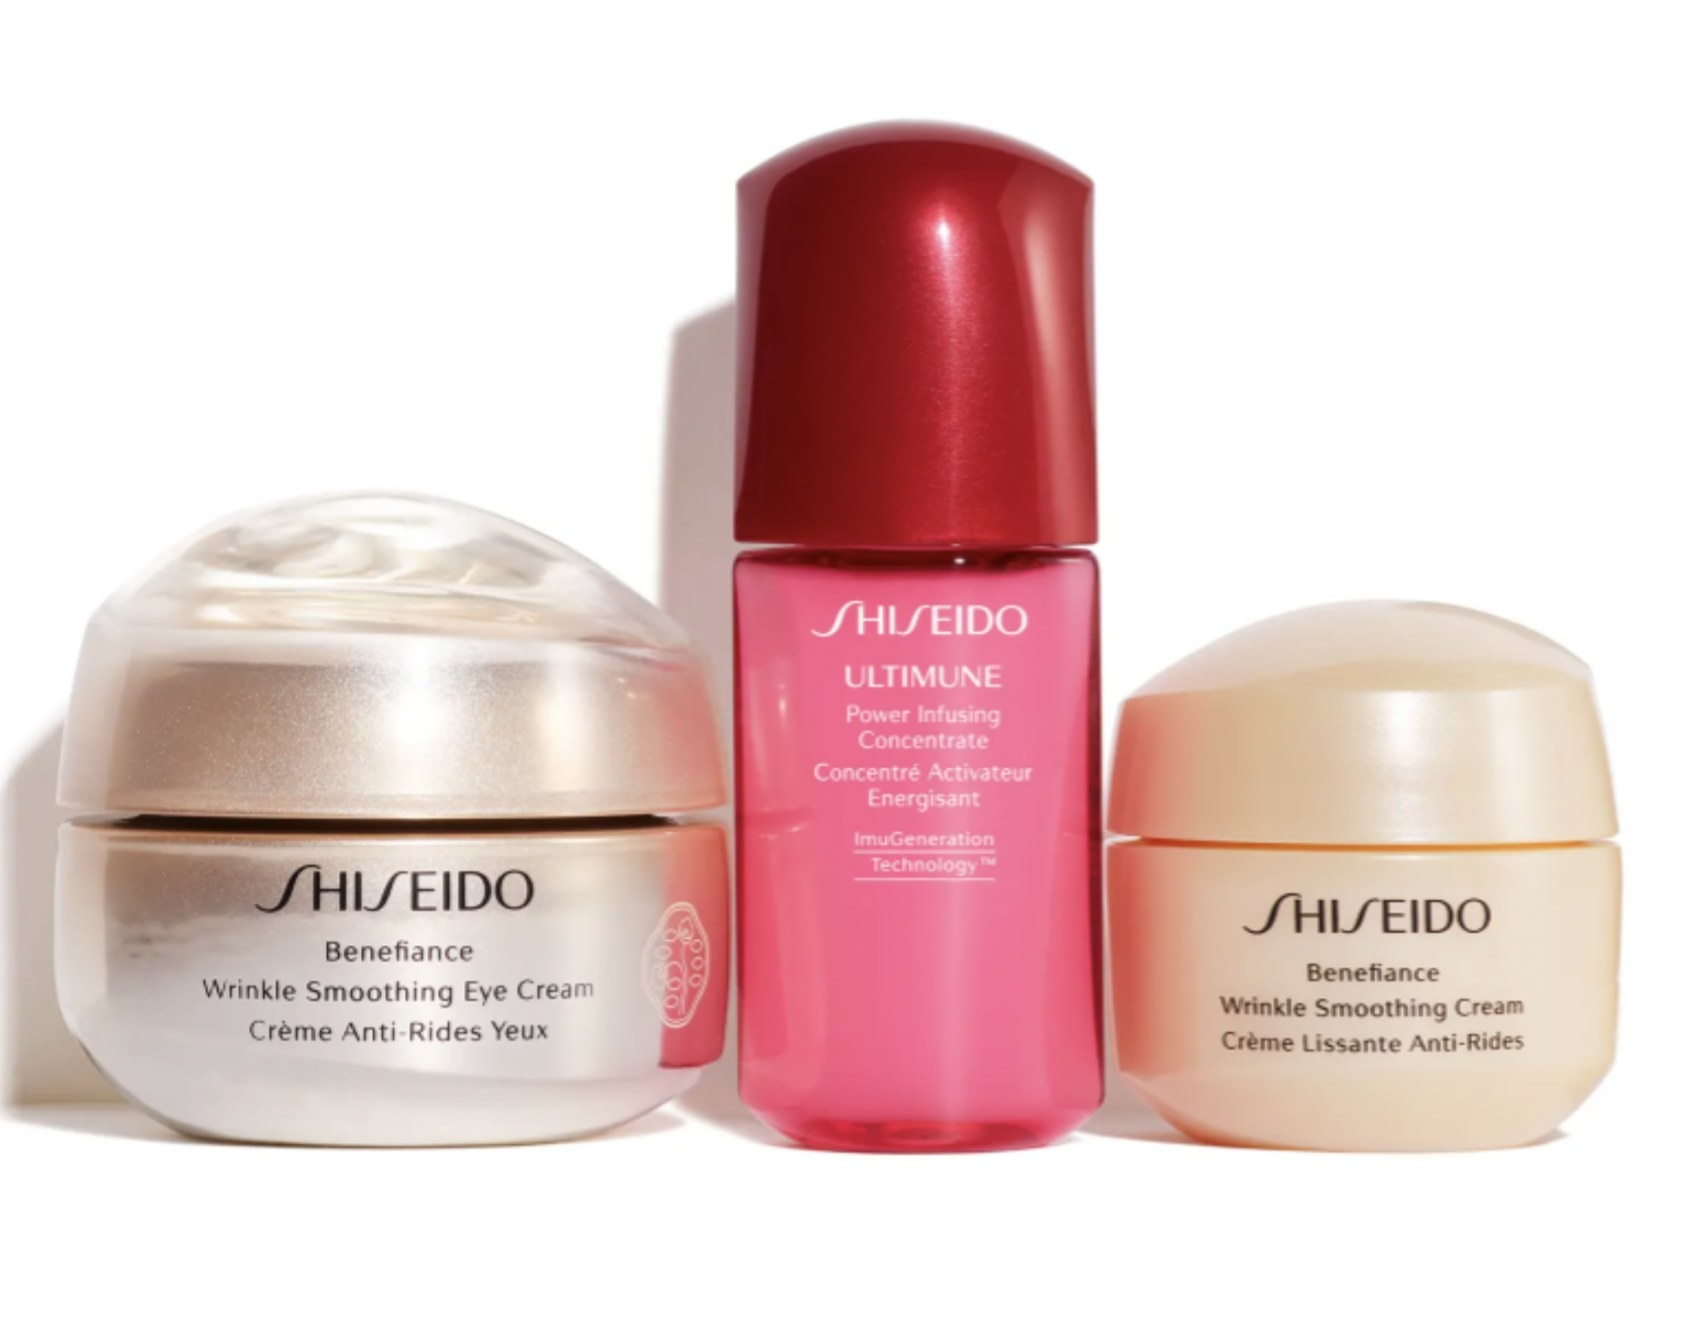 the three eye cream products